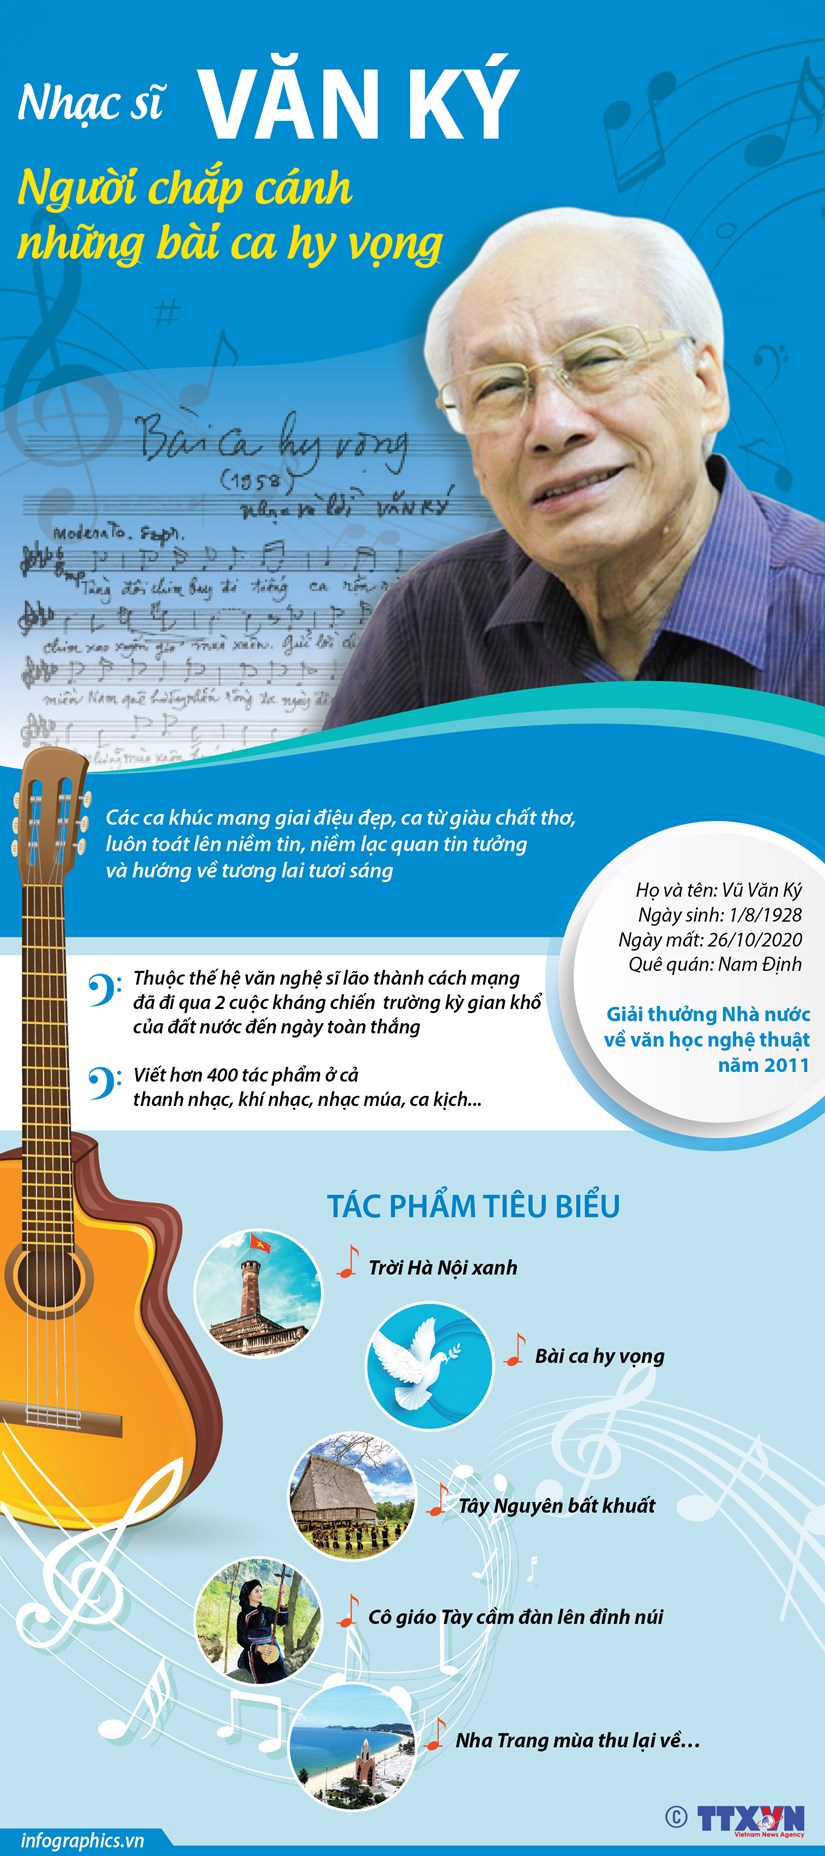 [Infographics] Nhac sy Van Ky: Nguoi chap canh nhung bai ca hy vong hinh anh 1